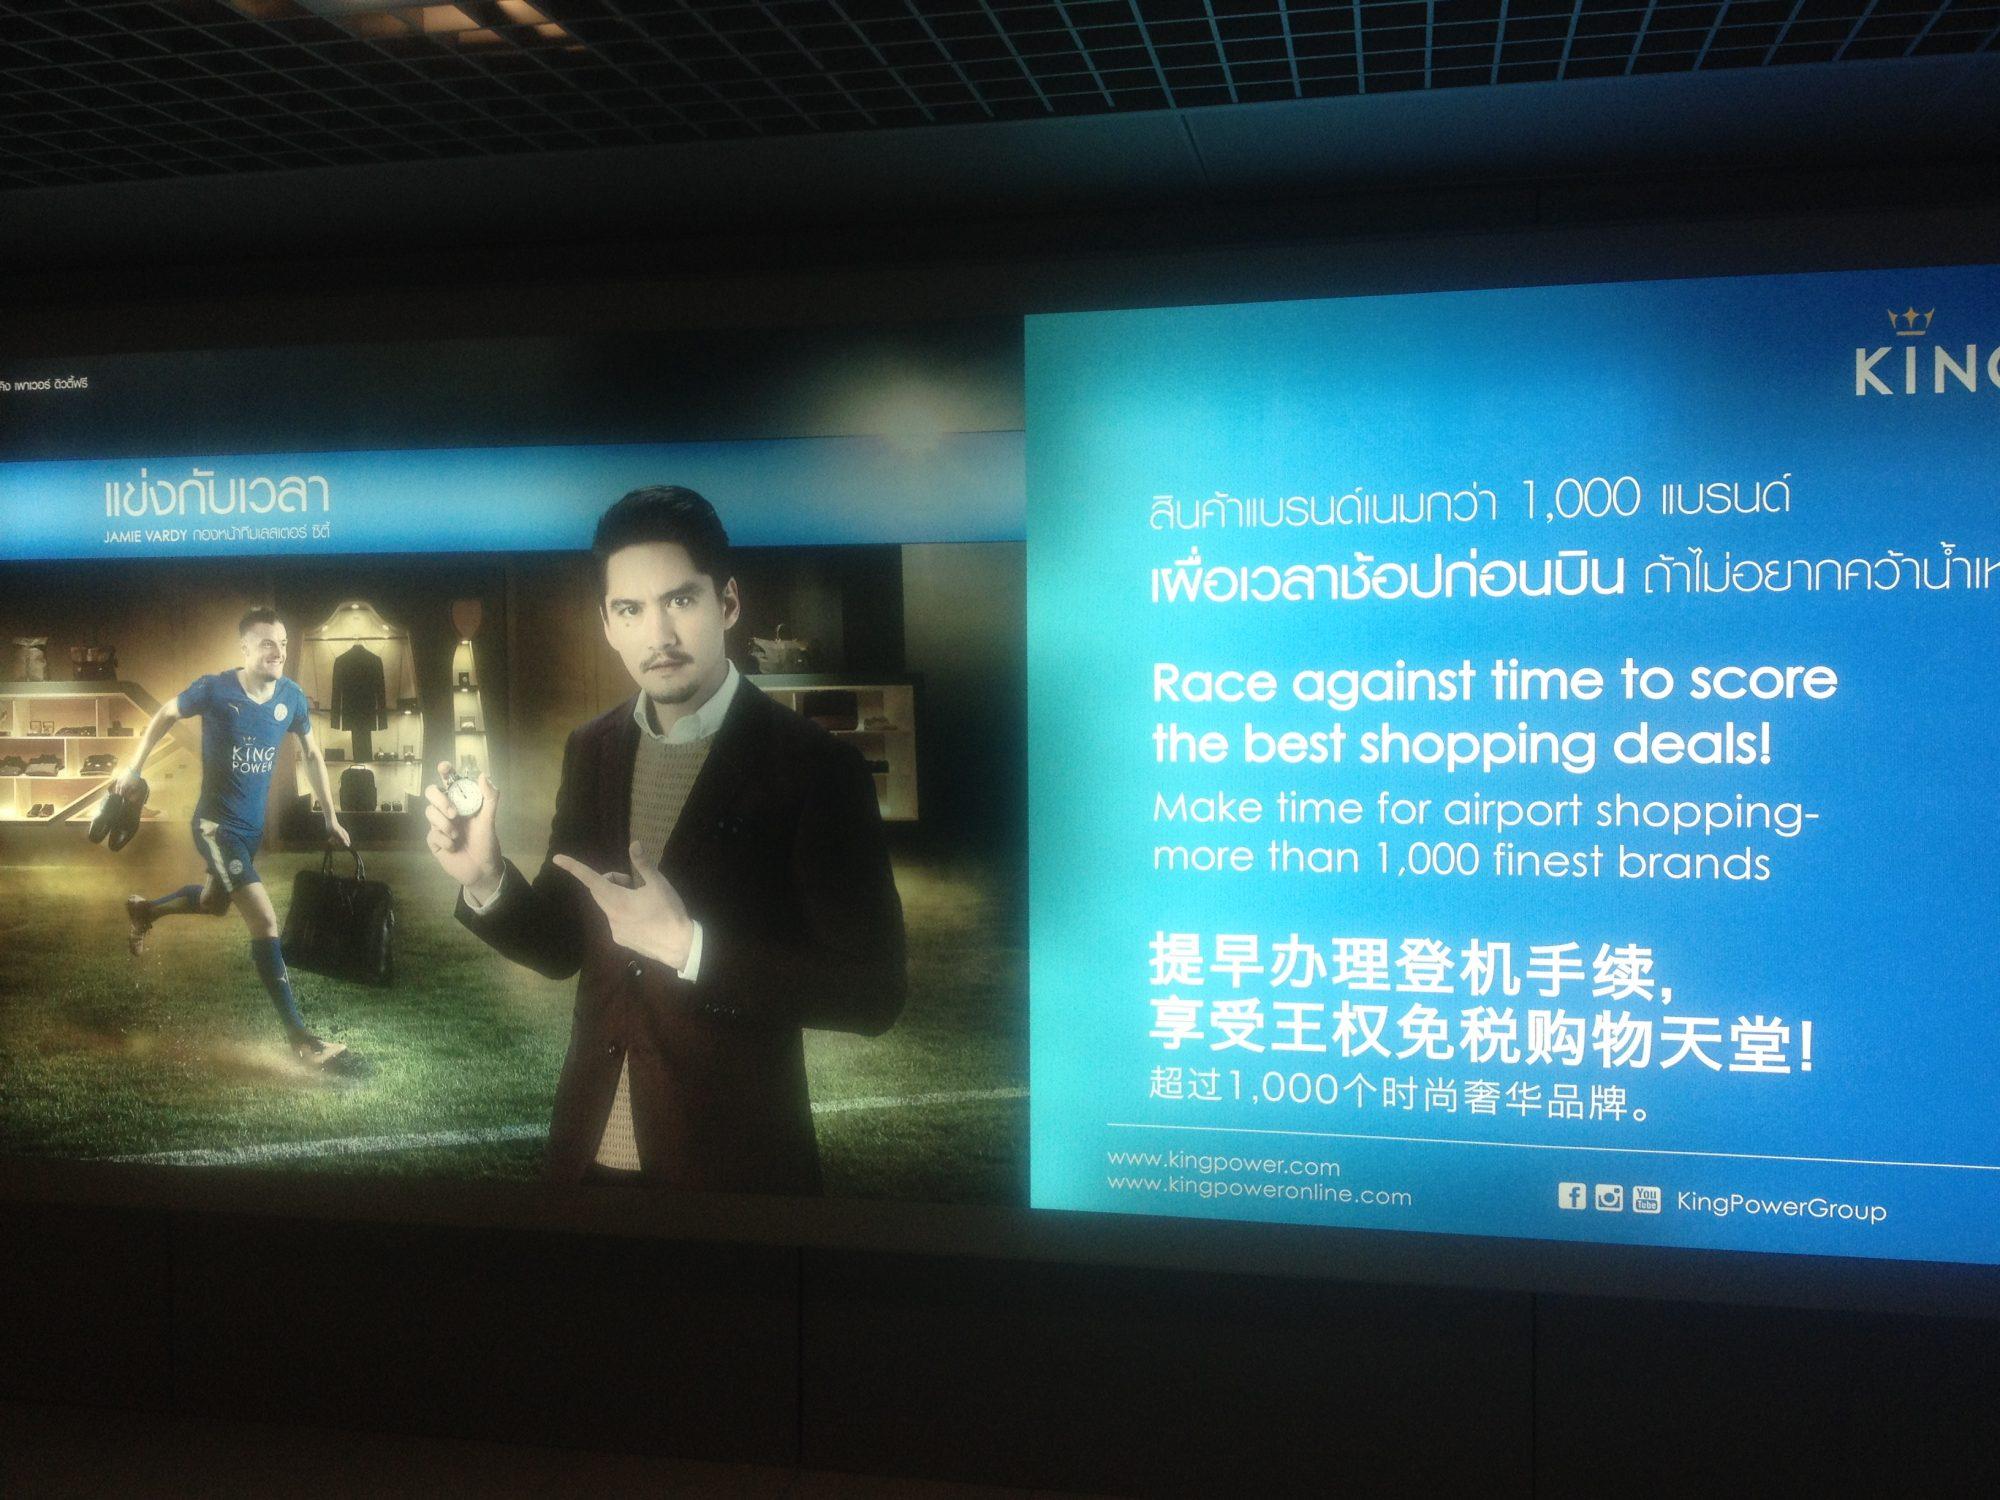 An advert in Bangkok, with Jamie Vardy